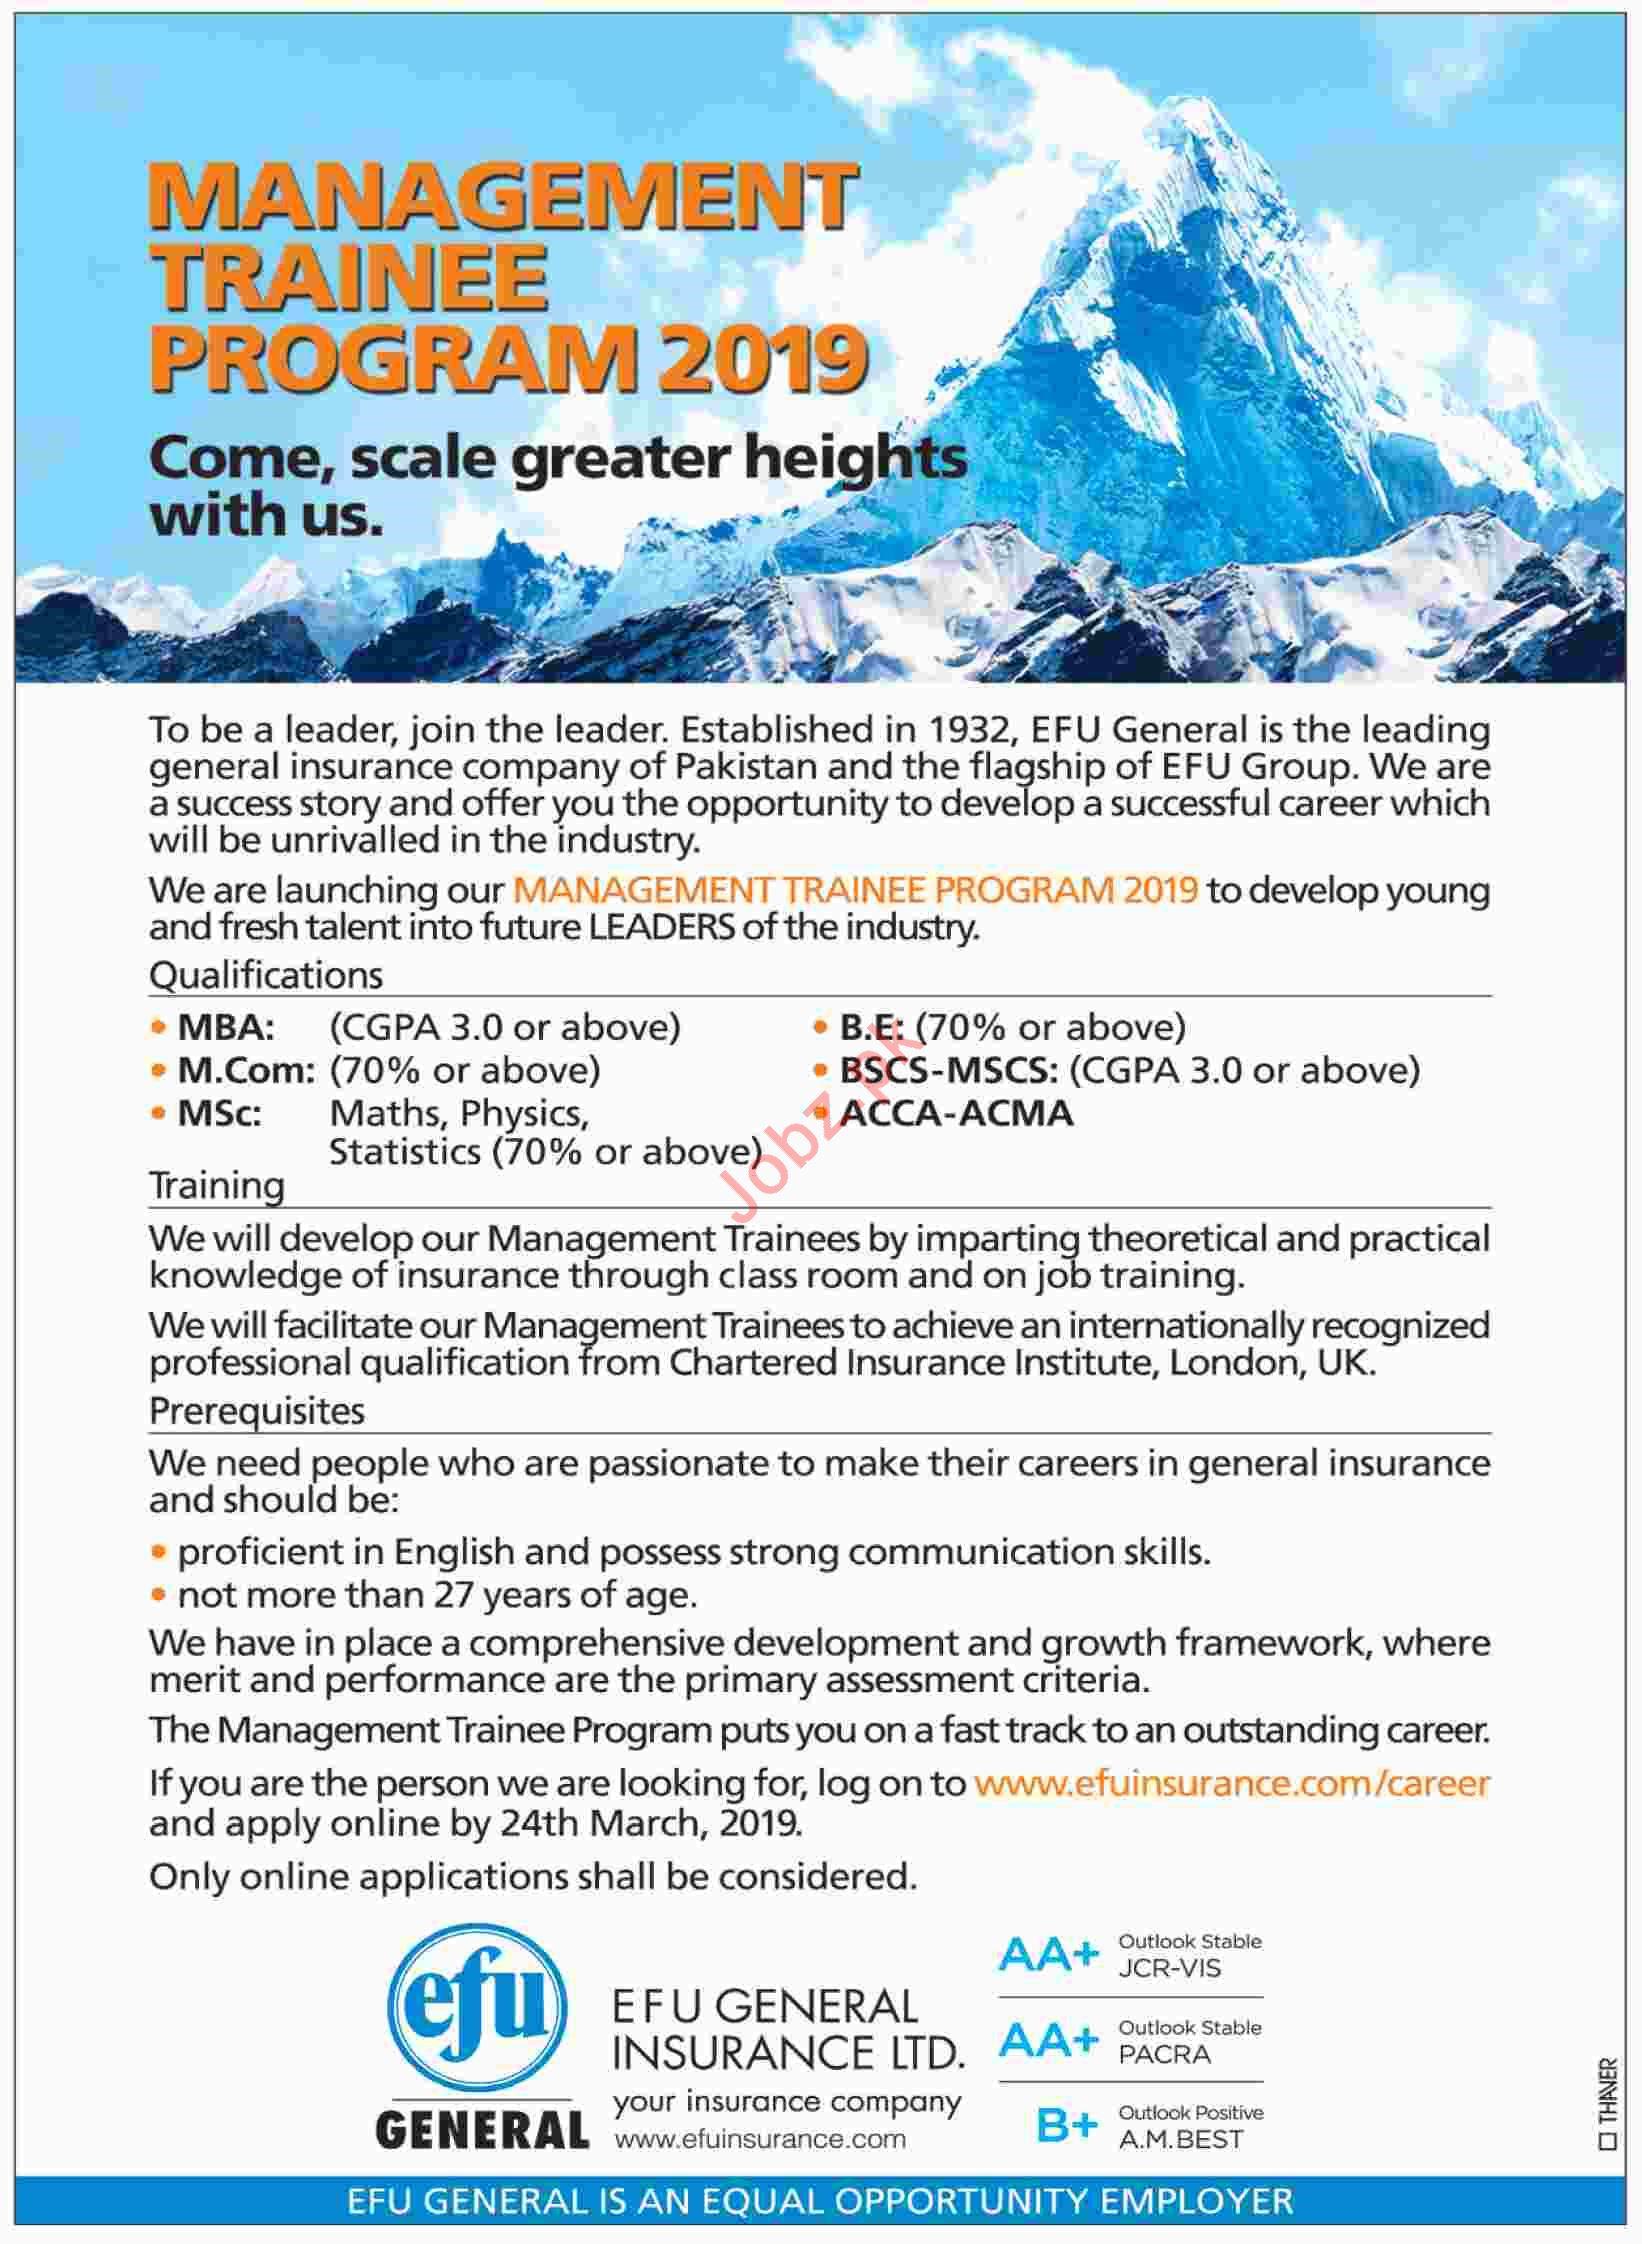 Efu General Insurance Ltd Management Trainee Program 2019